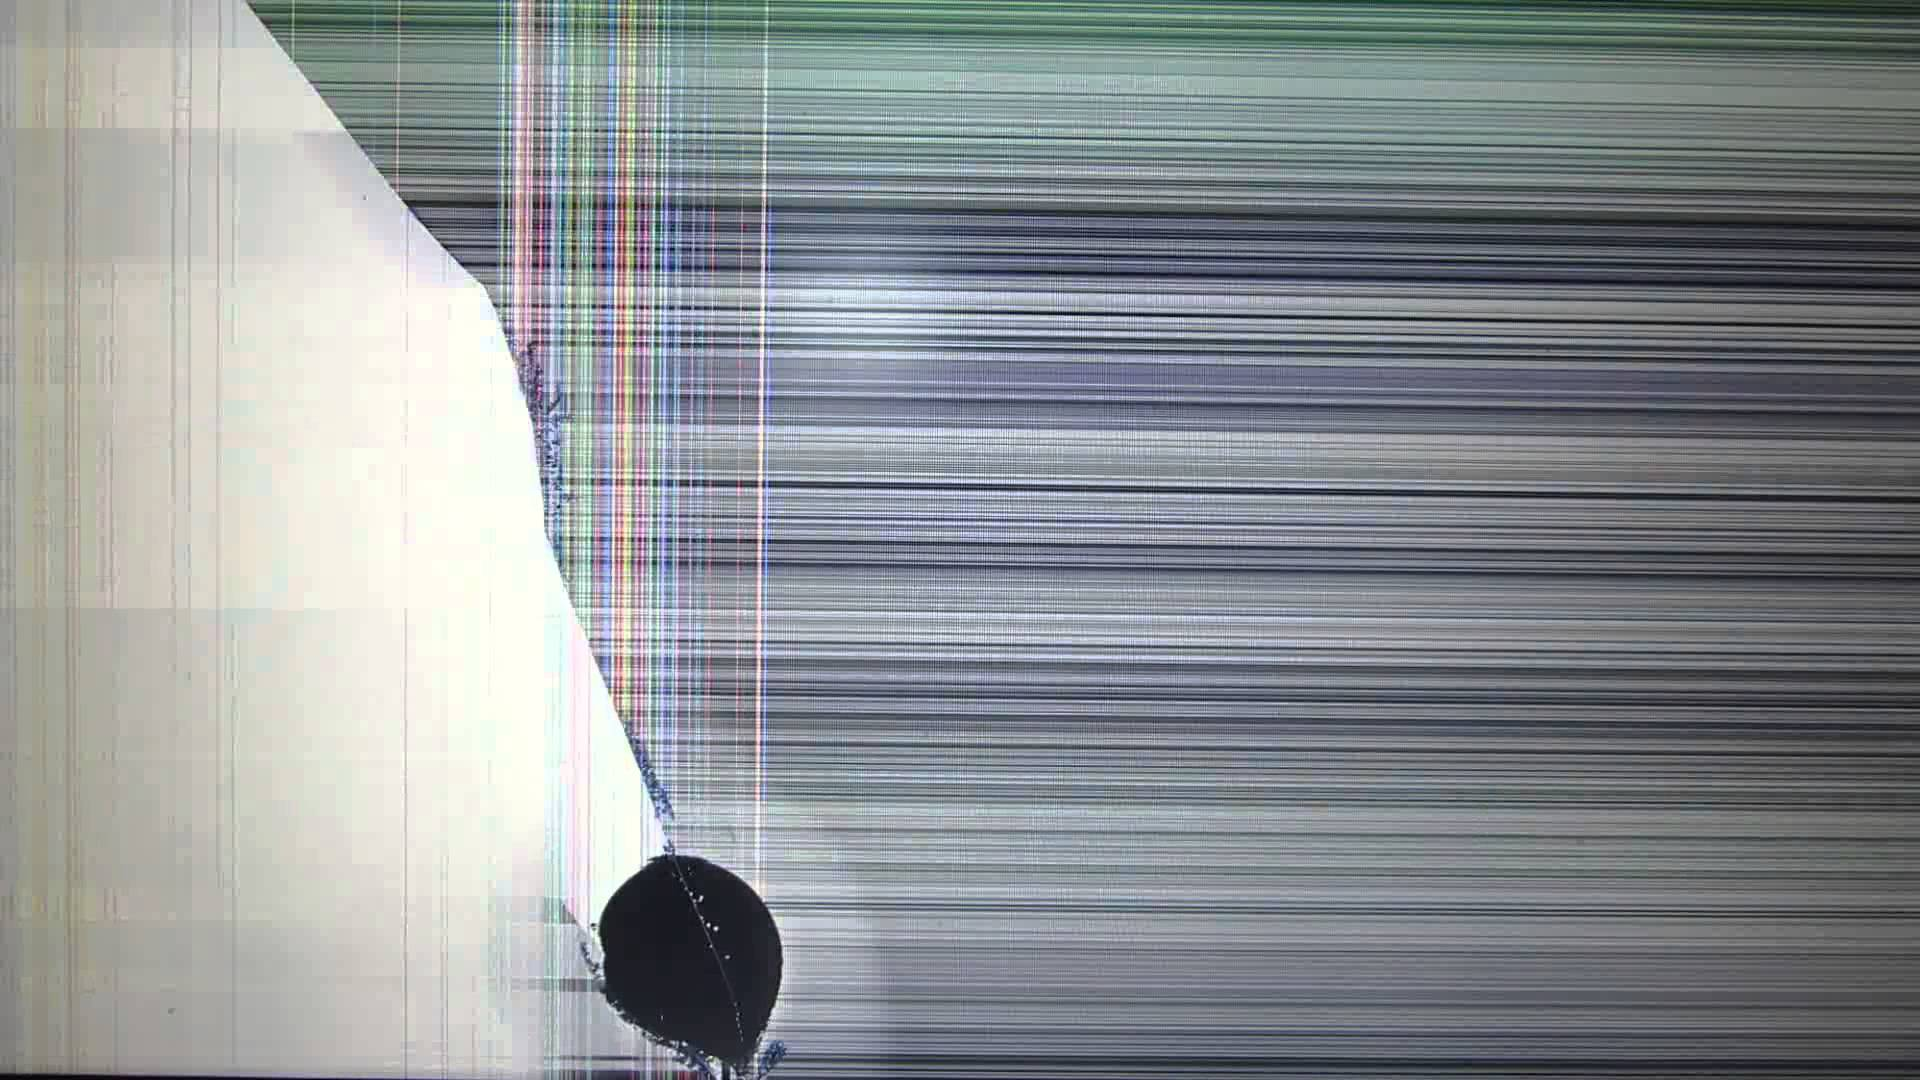 Broken Screen Bakgrundsbilder ID687708